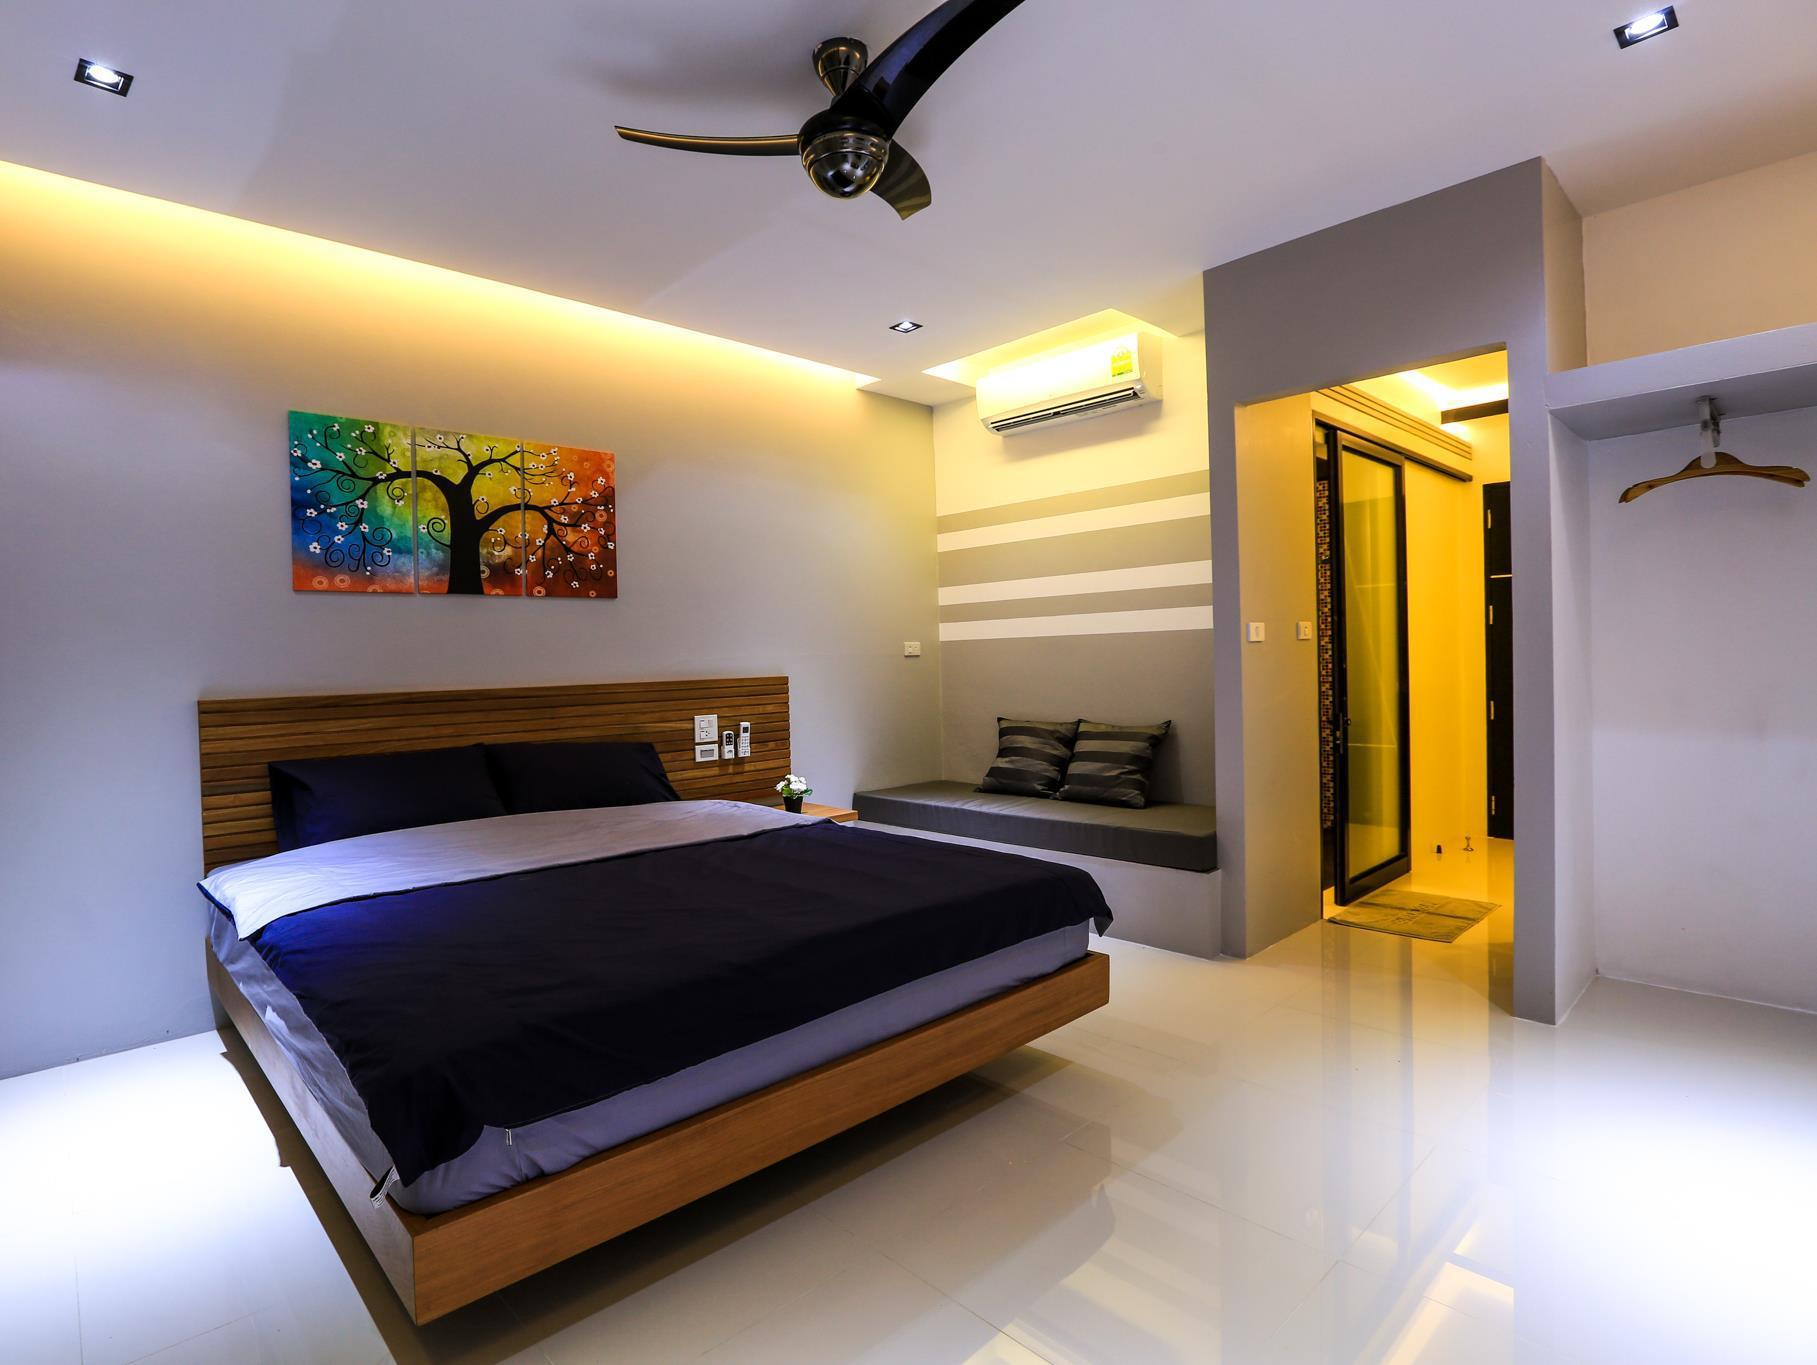 Chaantalay Hotel โรงแรมชานทะเล